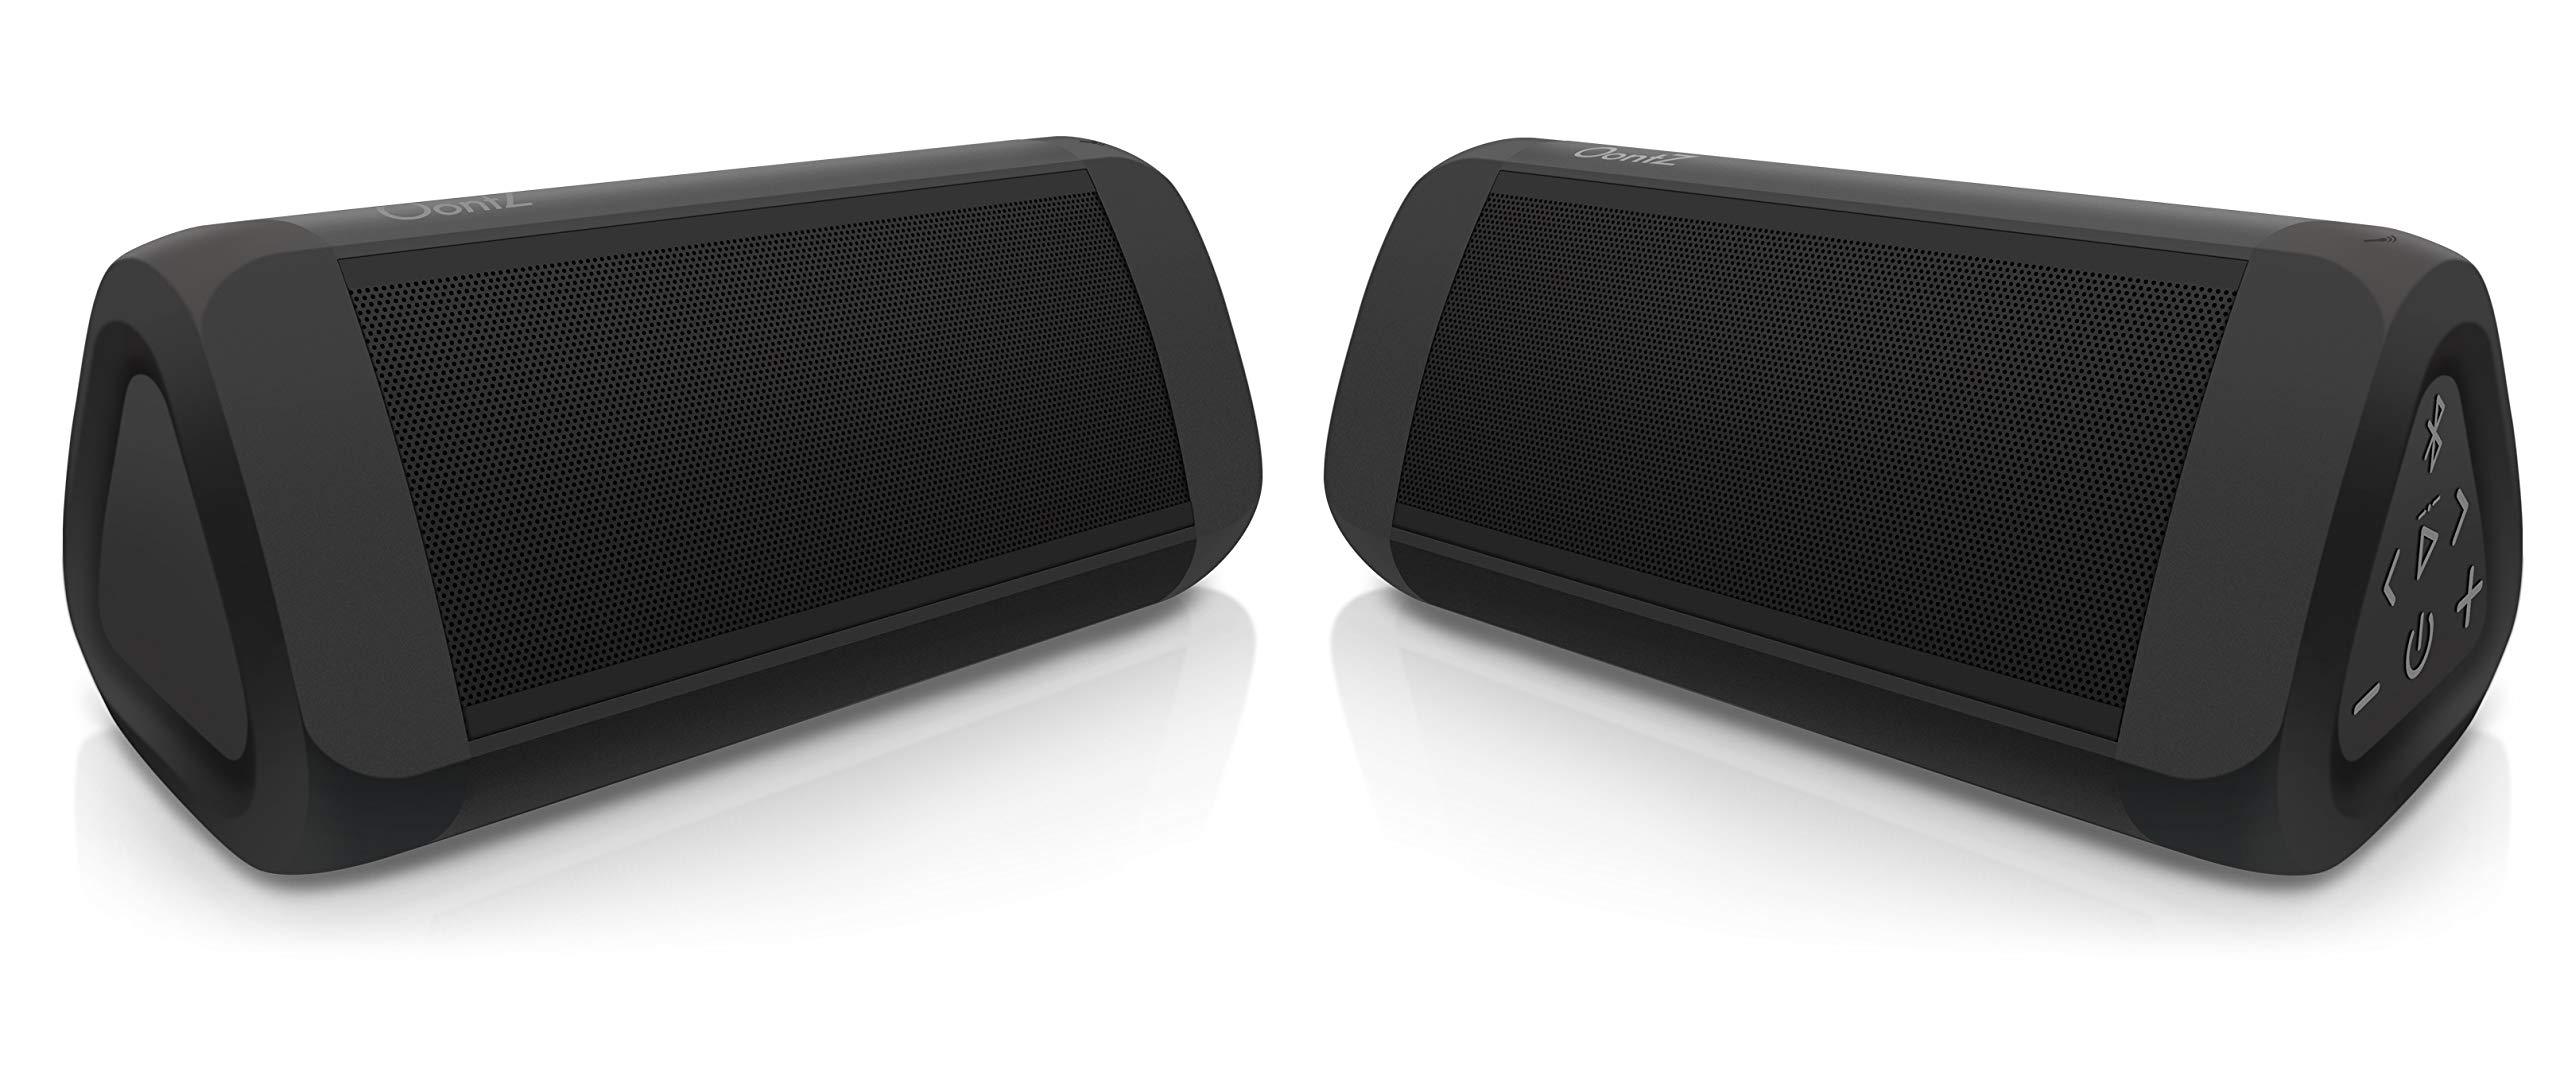 OontZ Angle 3 Ultra Portable Bluetooth Speaker, Two Speaker Edition, 14 Watts, Bigger Bass, Hi-Quality Sound, 100 Ft Wireless Range, IPX6, Bluetooth Speakers by Cambridge SoundWorks (Black) by Cambridge Soundworks